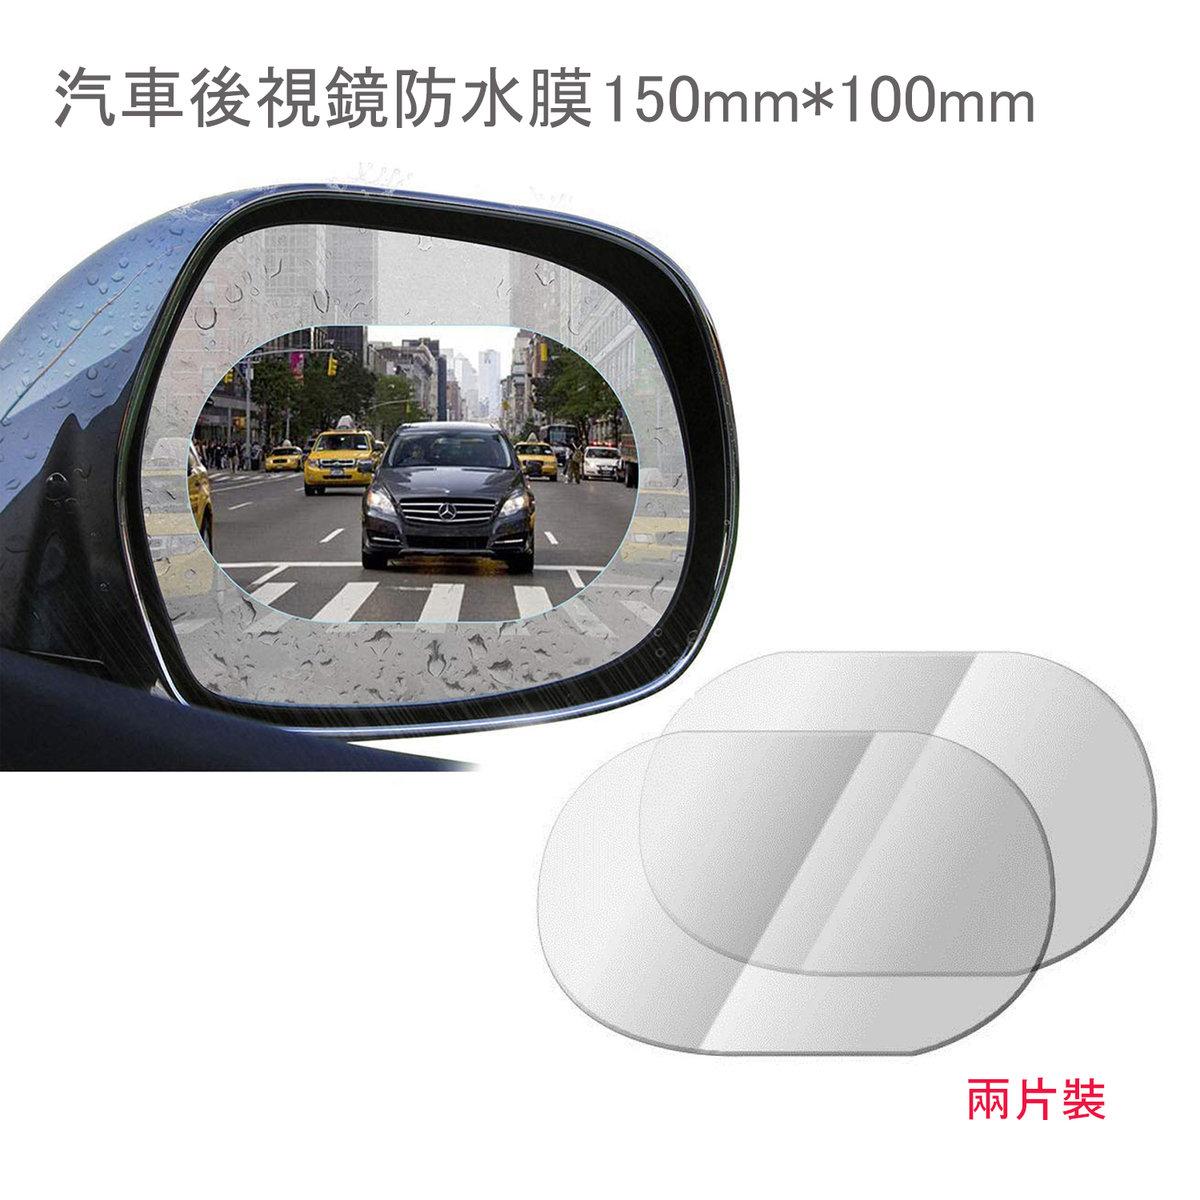 Anti-Fog Film Rearview Mirror 150mm*100mm